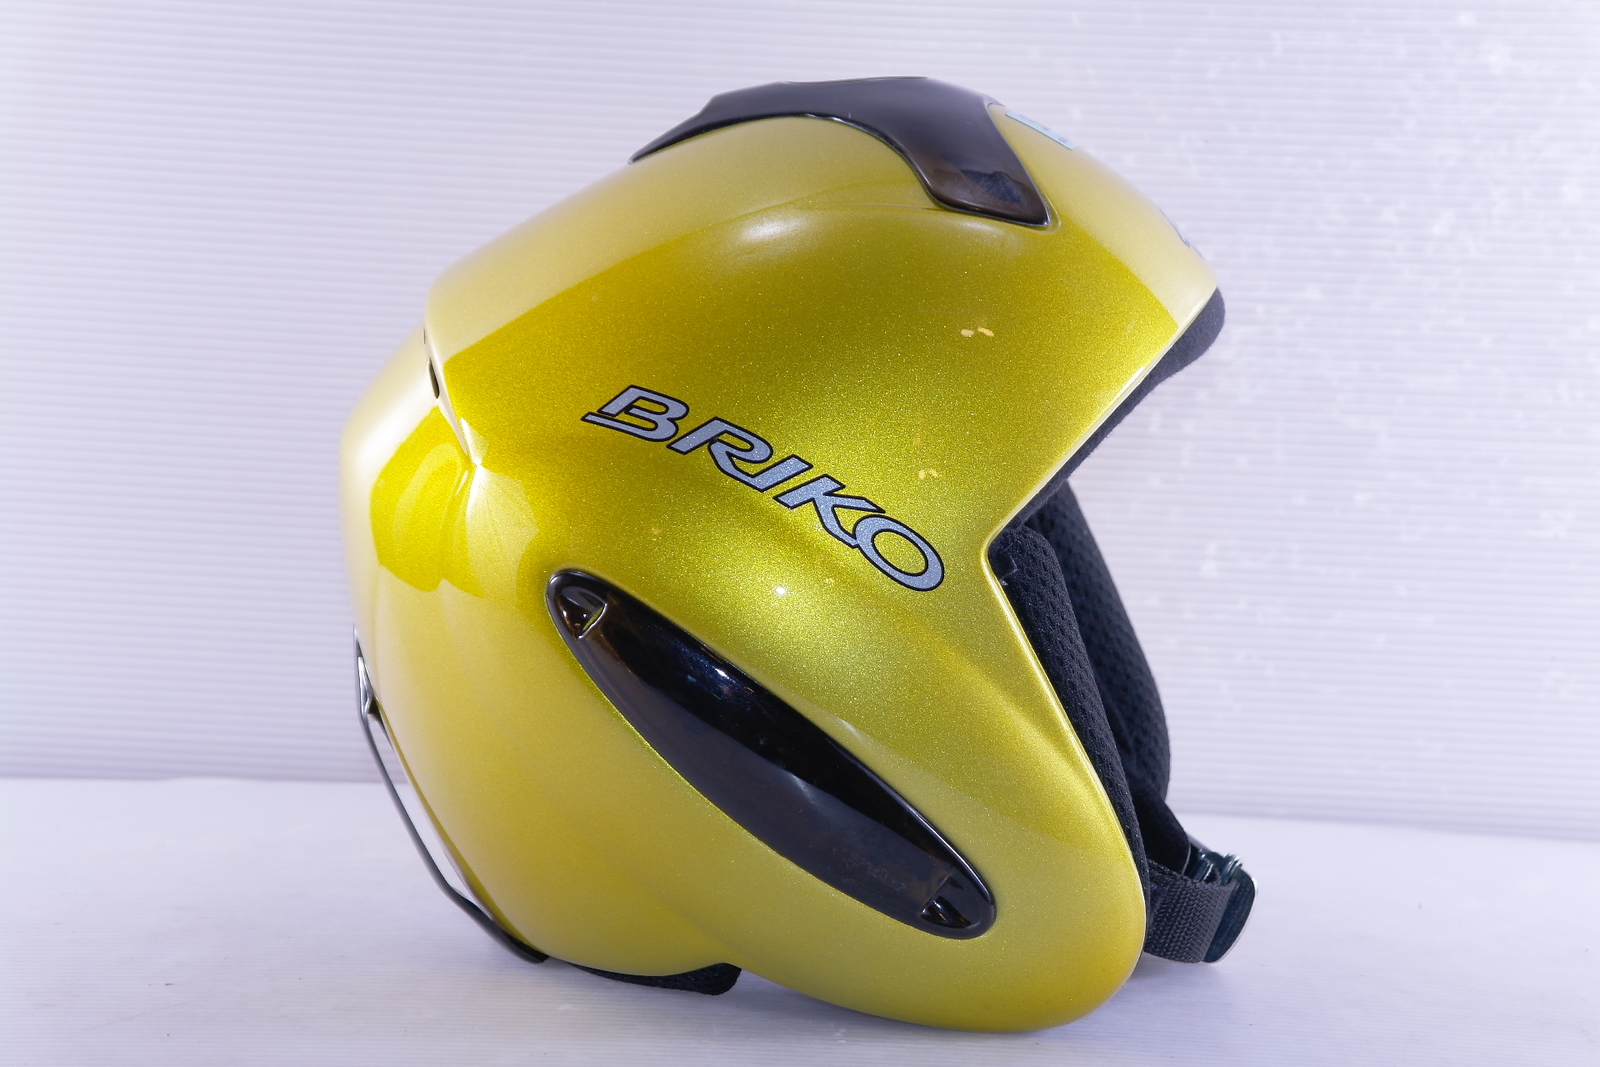 Dámská lyžařská helma Briko Forerunner vel. 56